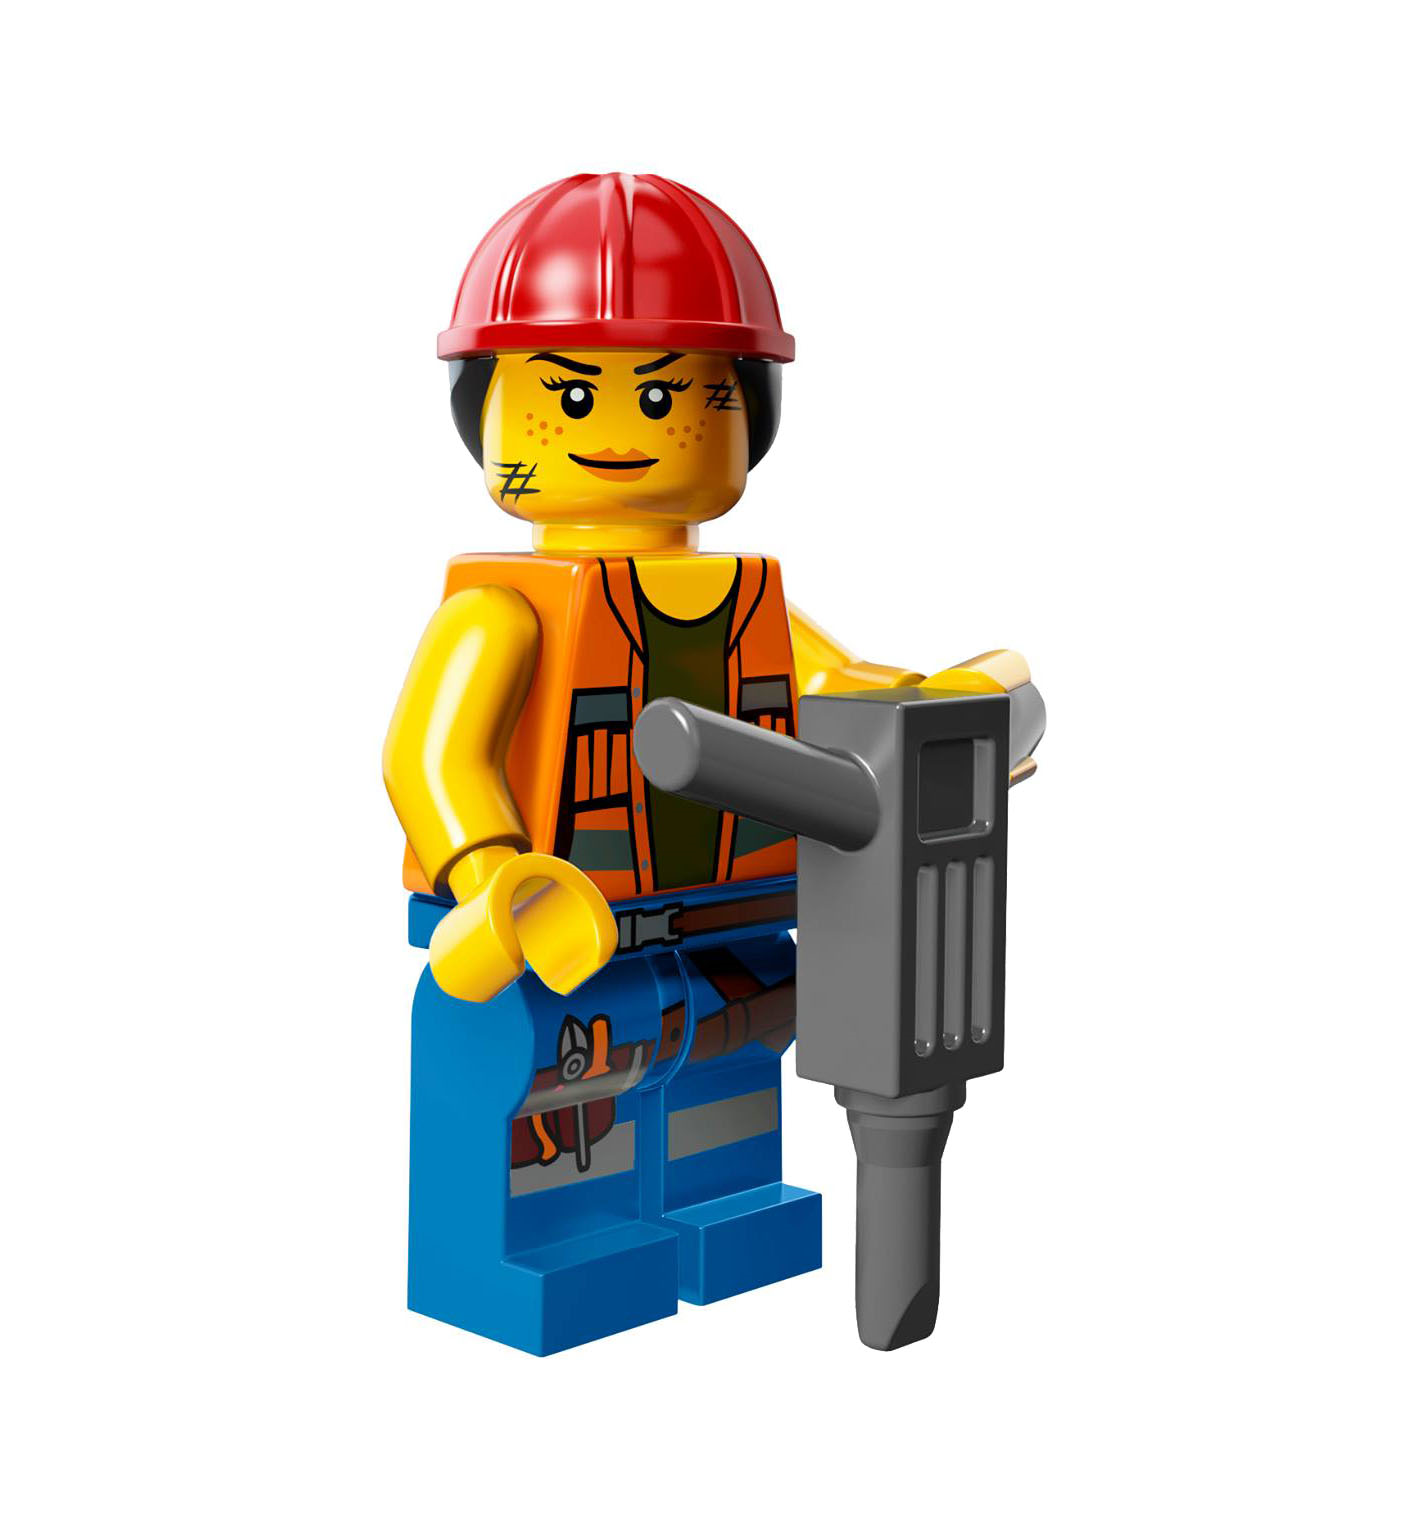 Obraz Gail The Construction Worker Png Lego Przygoda